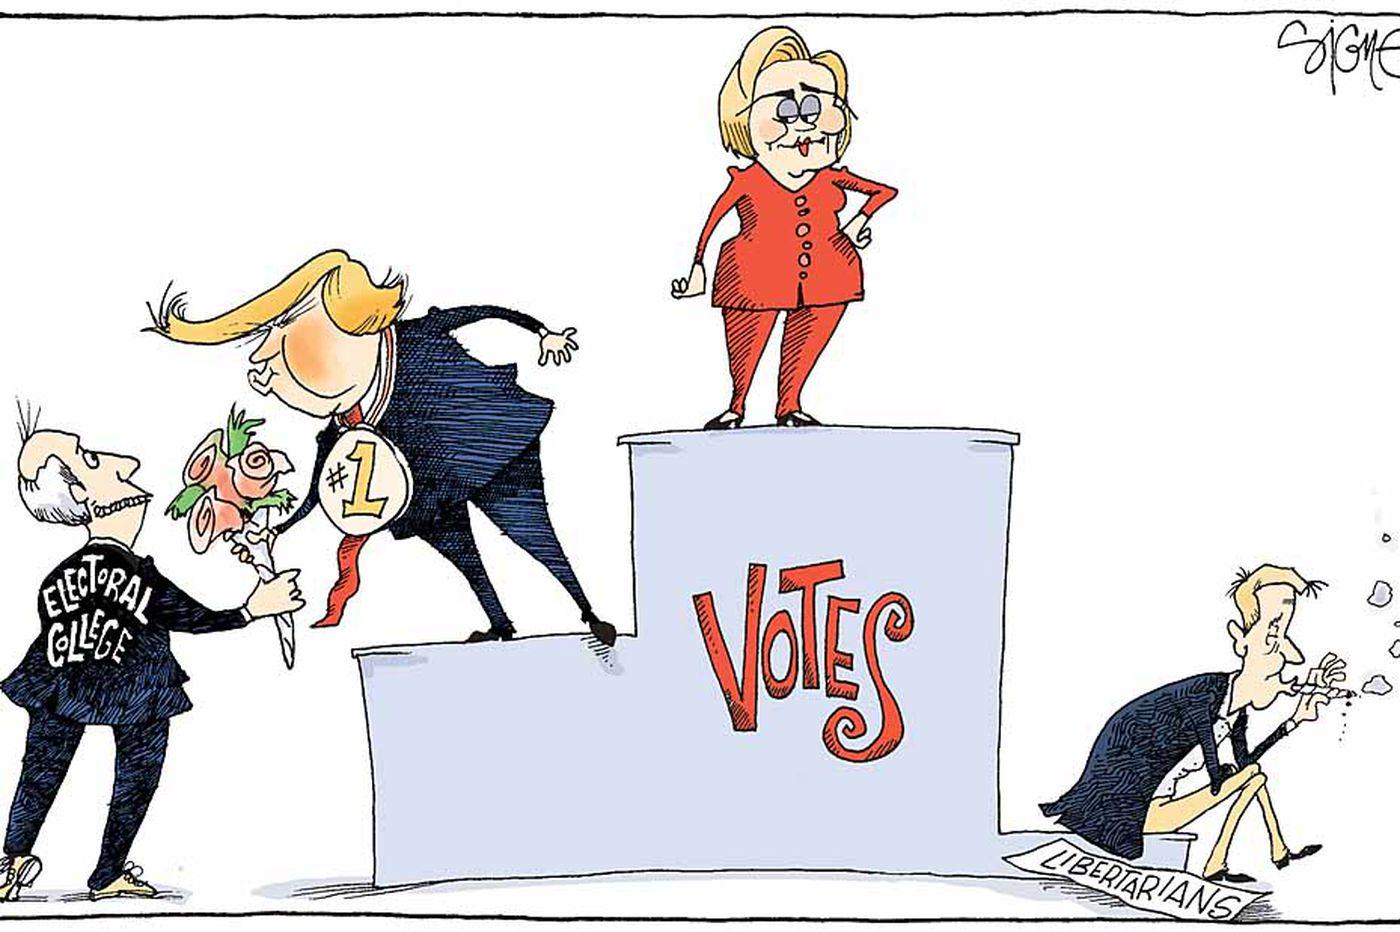 Daily Signe Cartoon 11/30/16